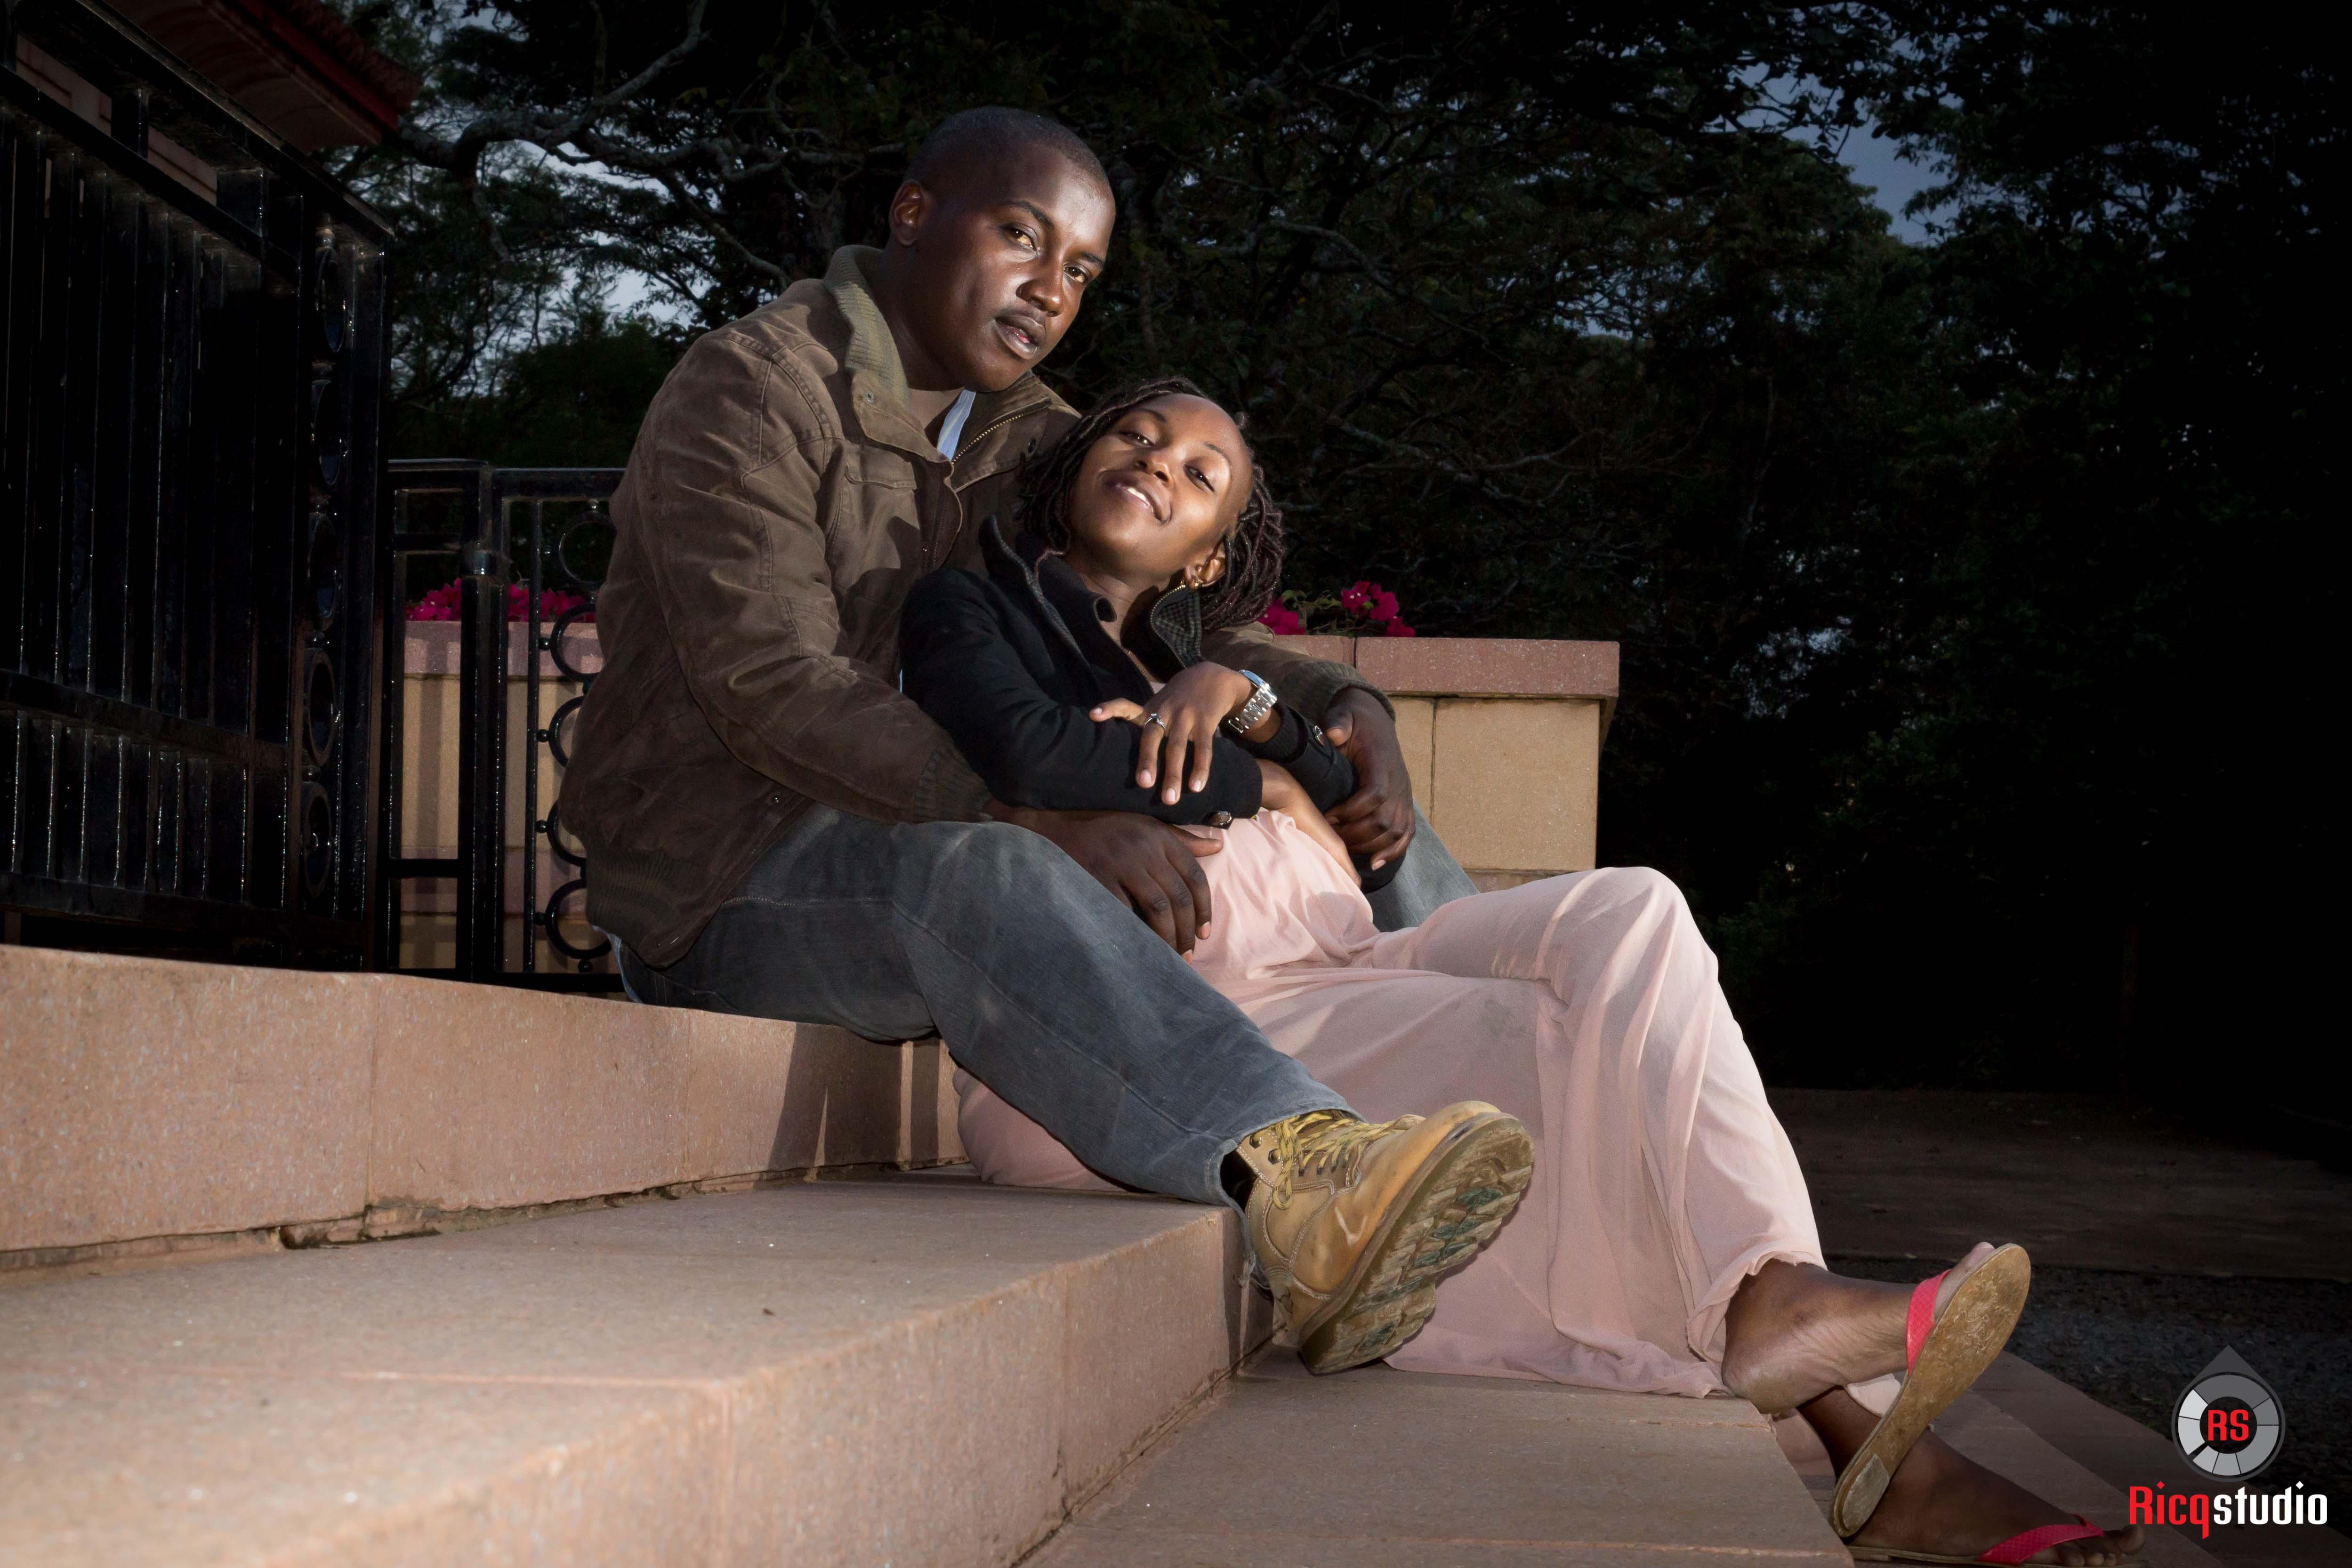 wedding photographer_ engagement in Kenya_ricqstudio-44